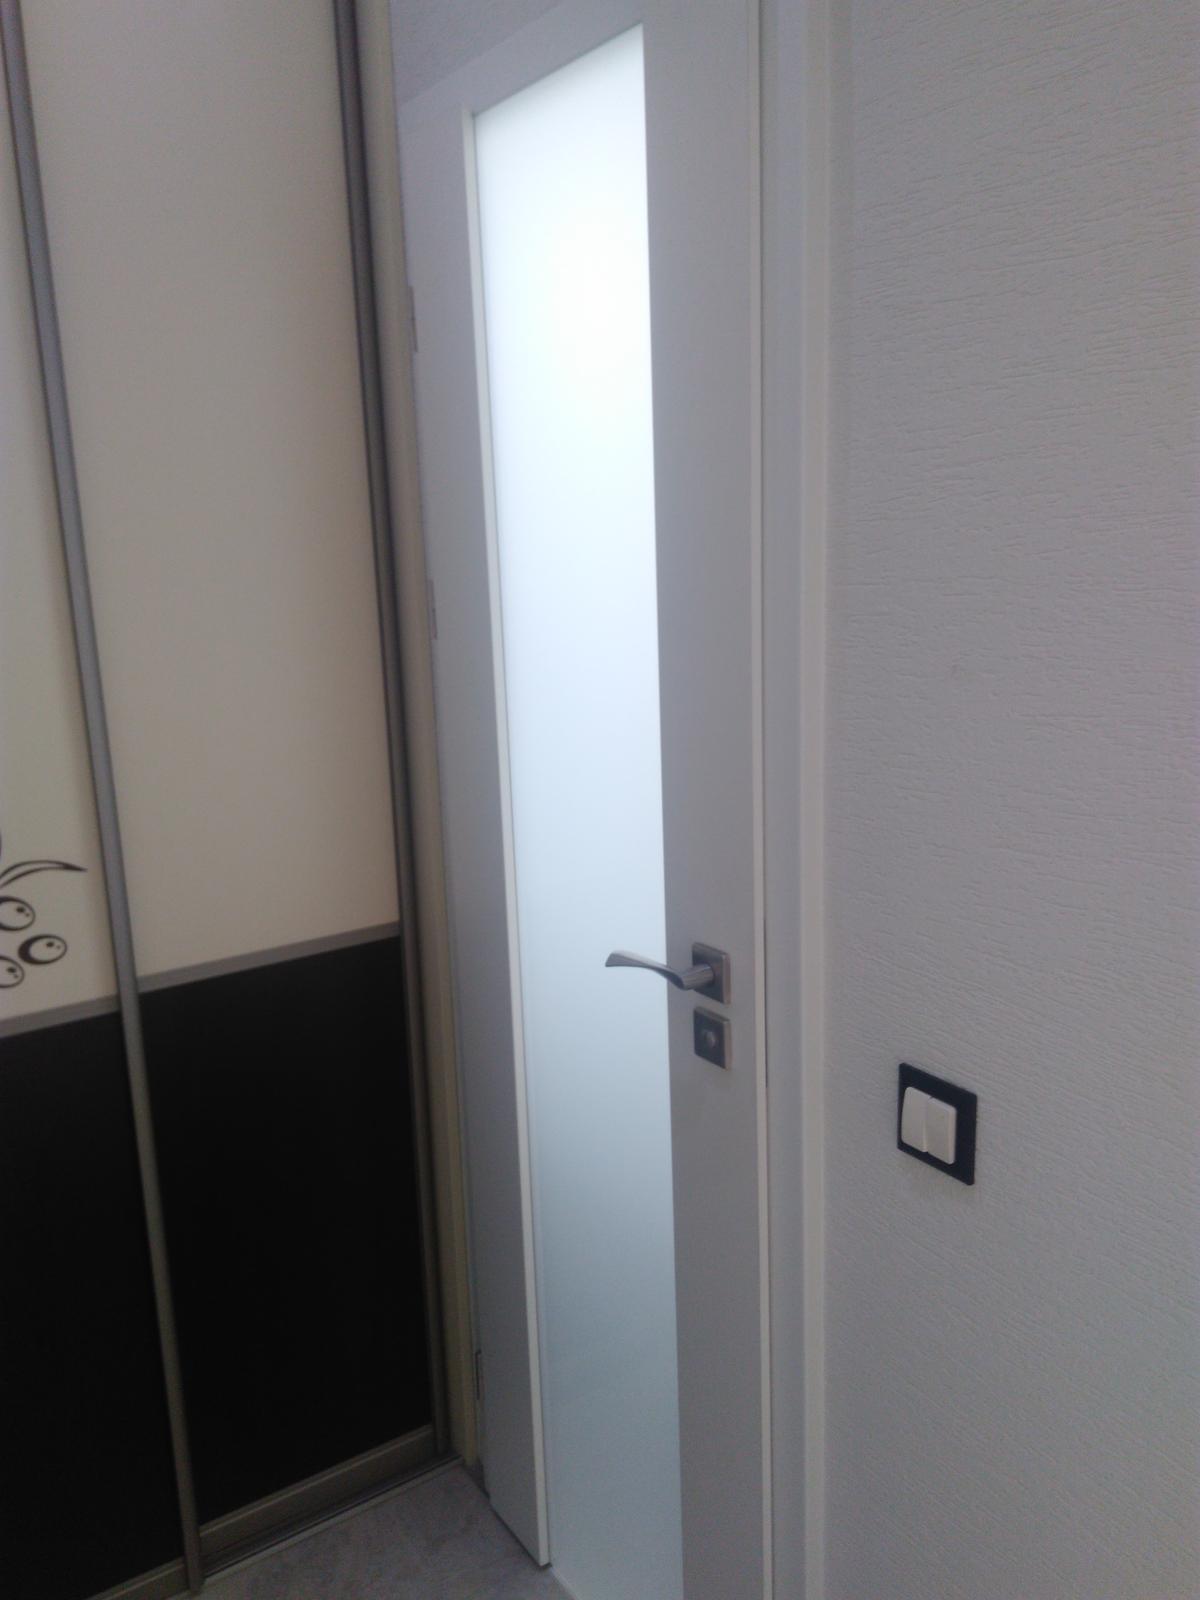 Interierove dvere - Obrázok č. 14